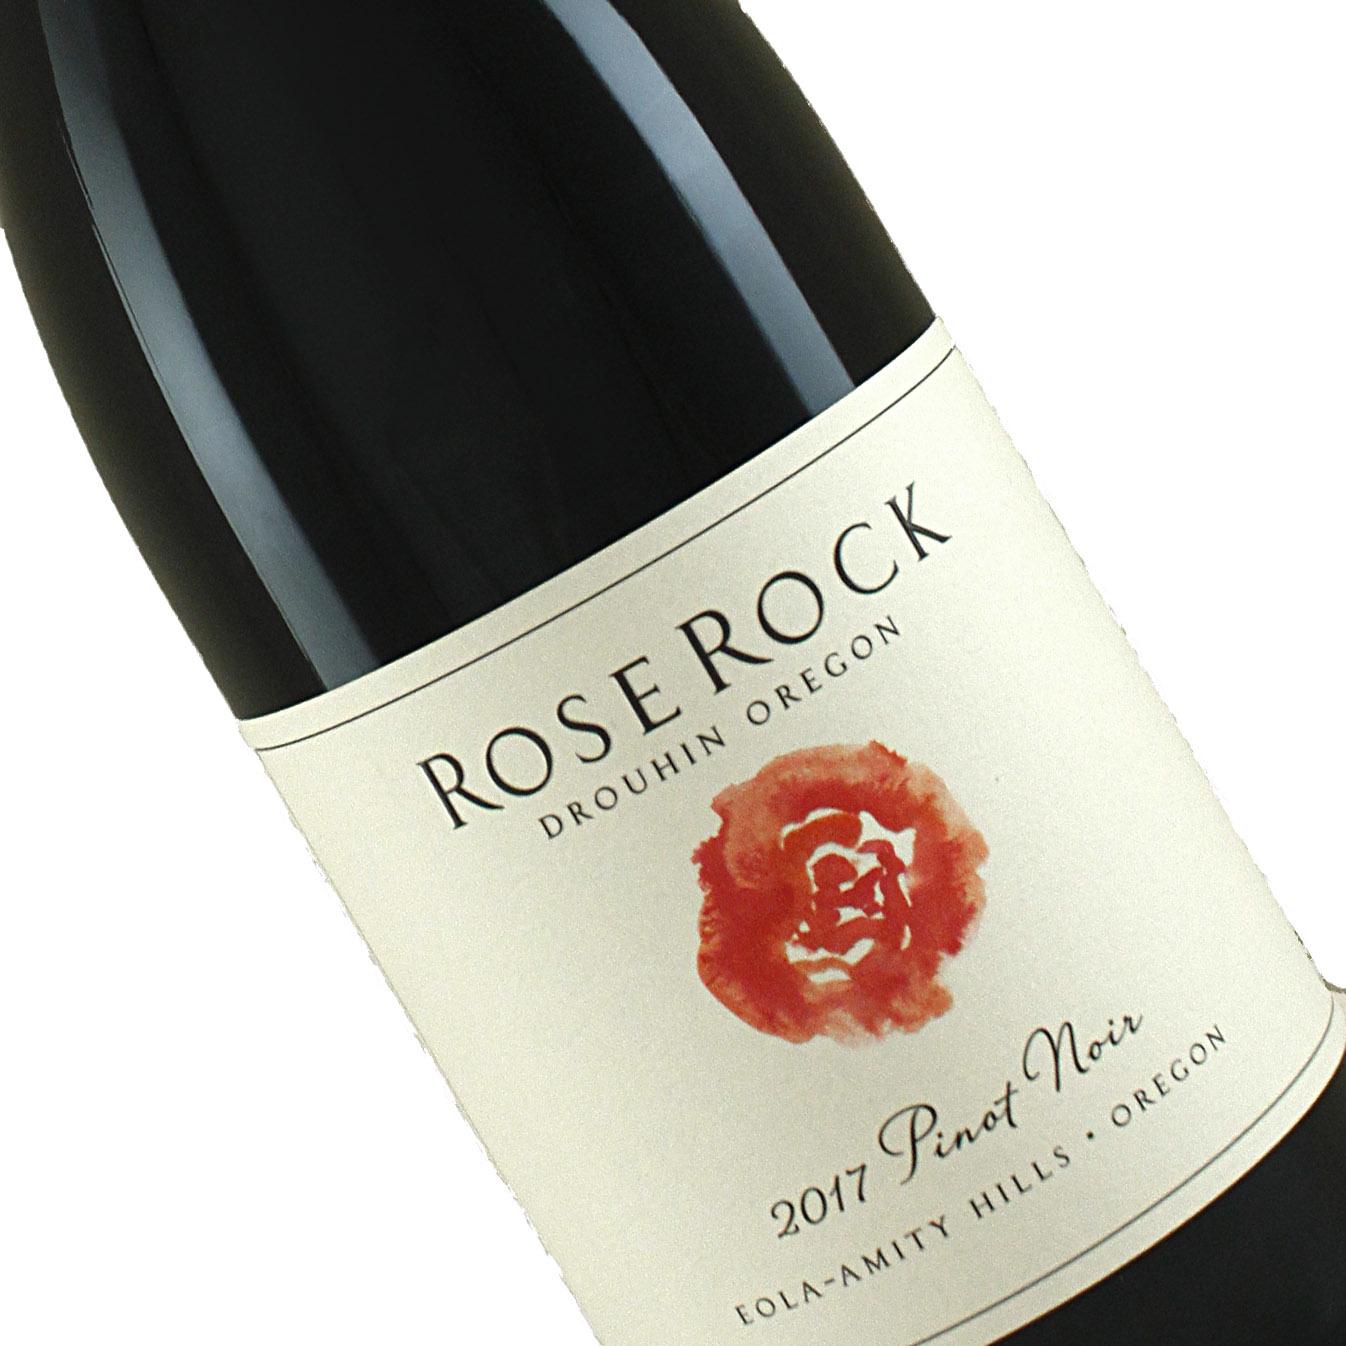 RoseRock by Domaine Drouhin 2017 Pinot Noir Eola-Amity Hills, Oregon